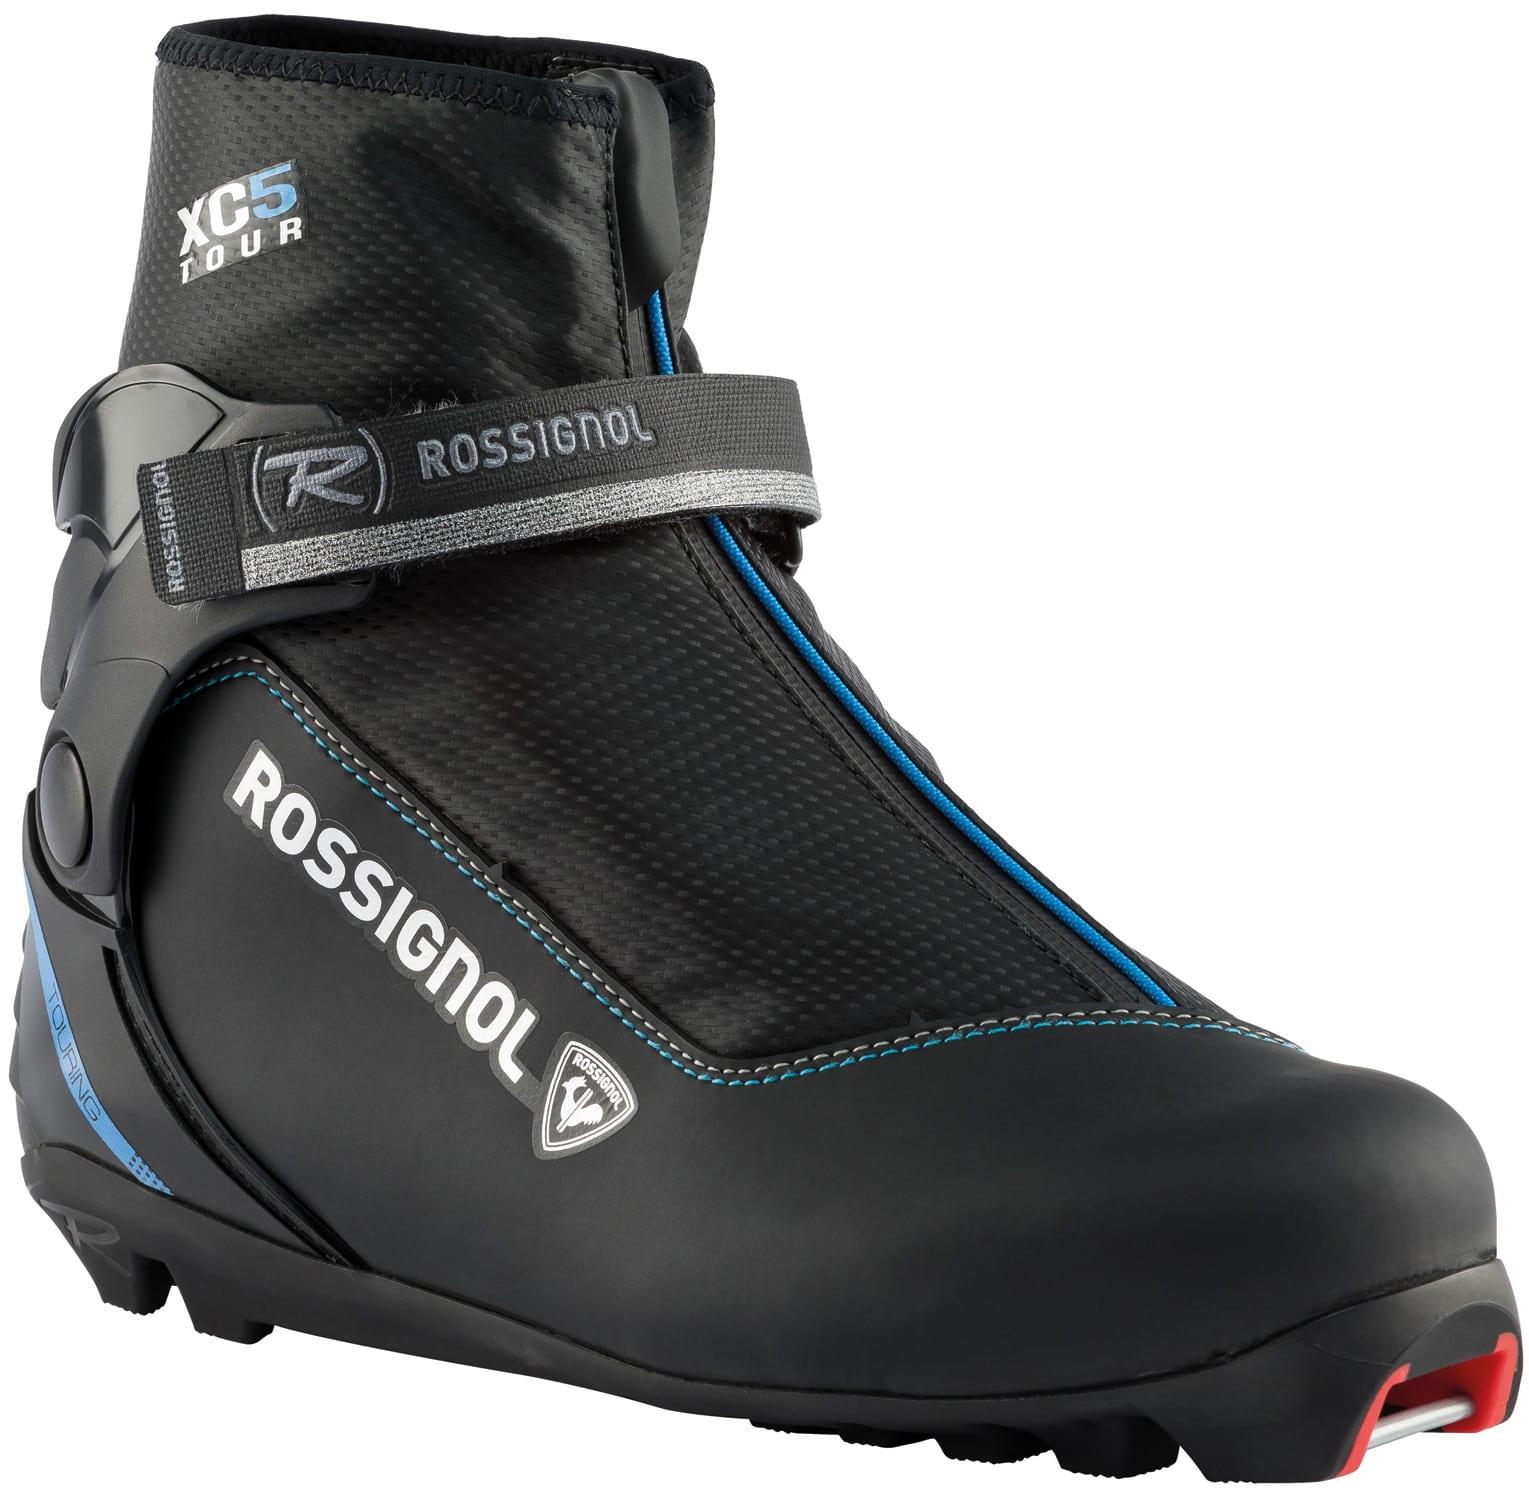 Rossignol EVO OT 65 IFP Positrack Mens XC Skis W//Control Step in Bindings